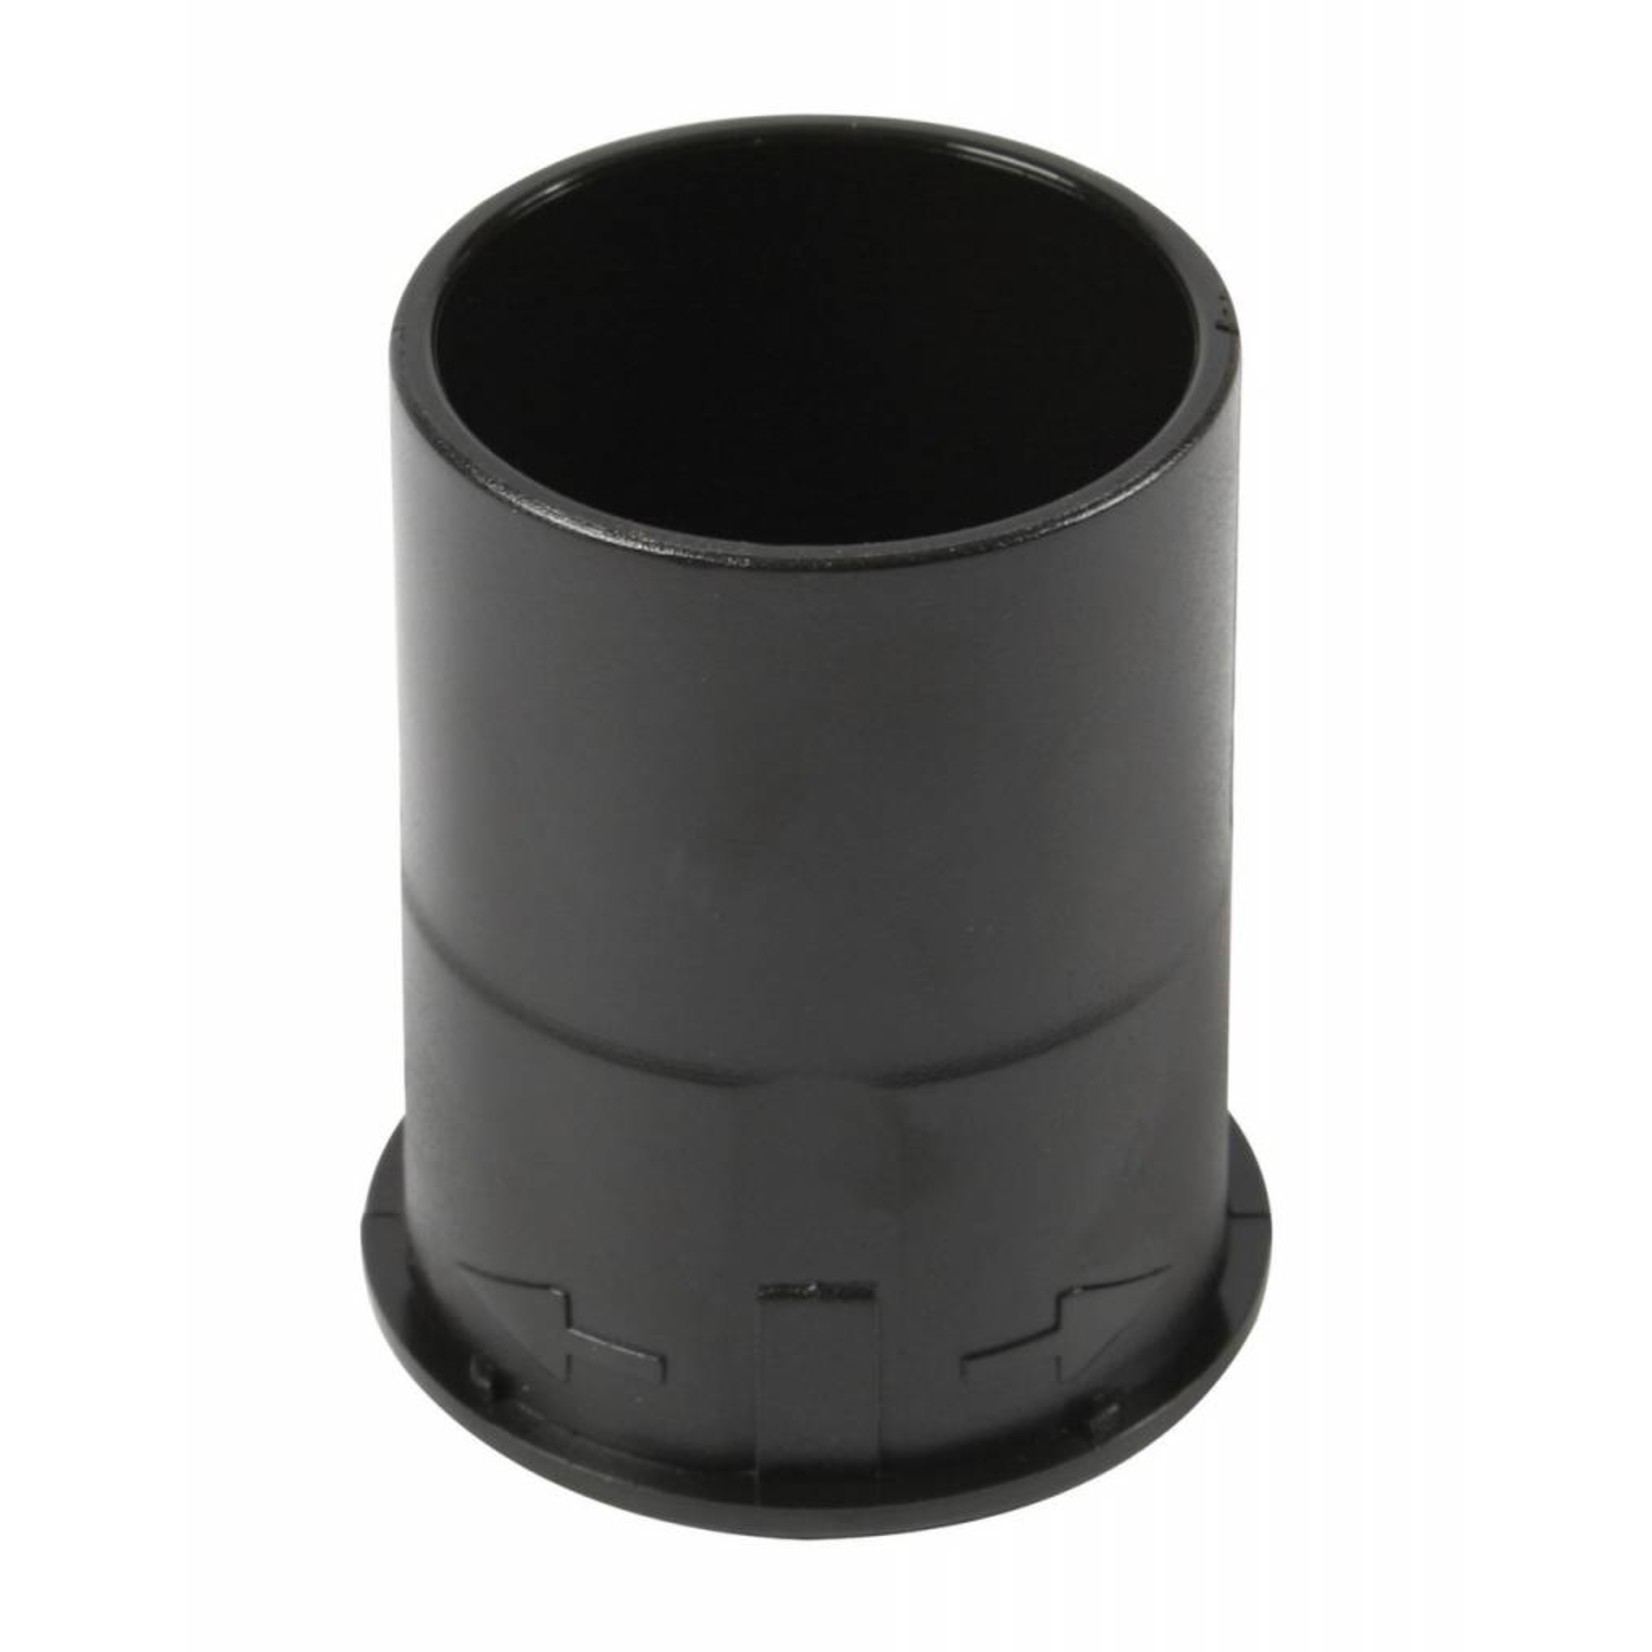 "Centec CenTec Adapter 1.375"" (35mm) to 1.25"" (32mm)"